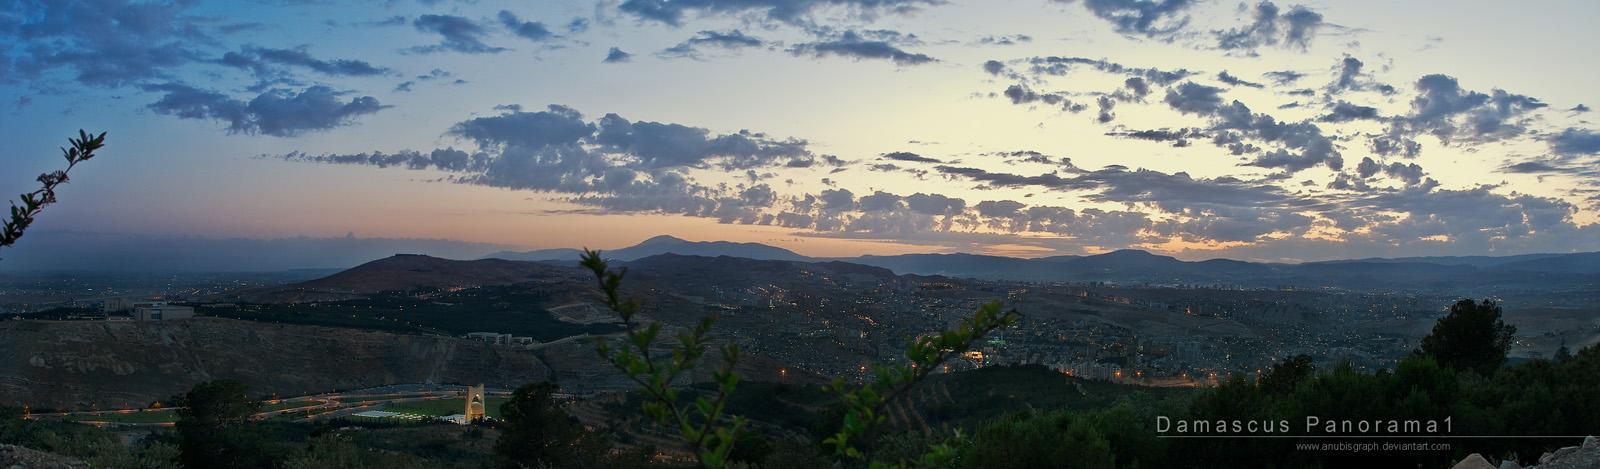 Damascus Panorama 1 by AnubisGraph